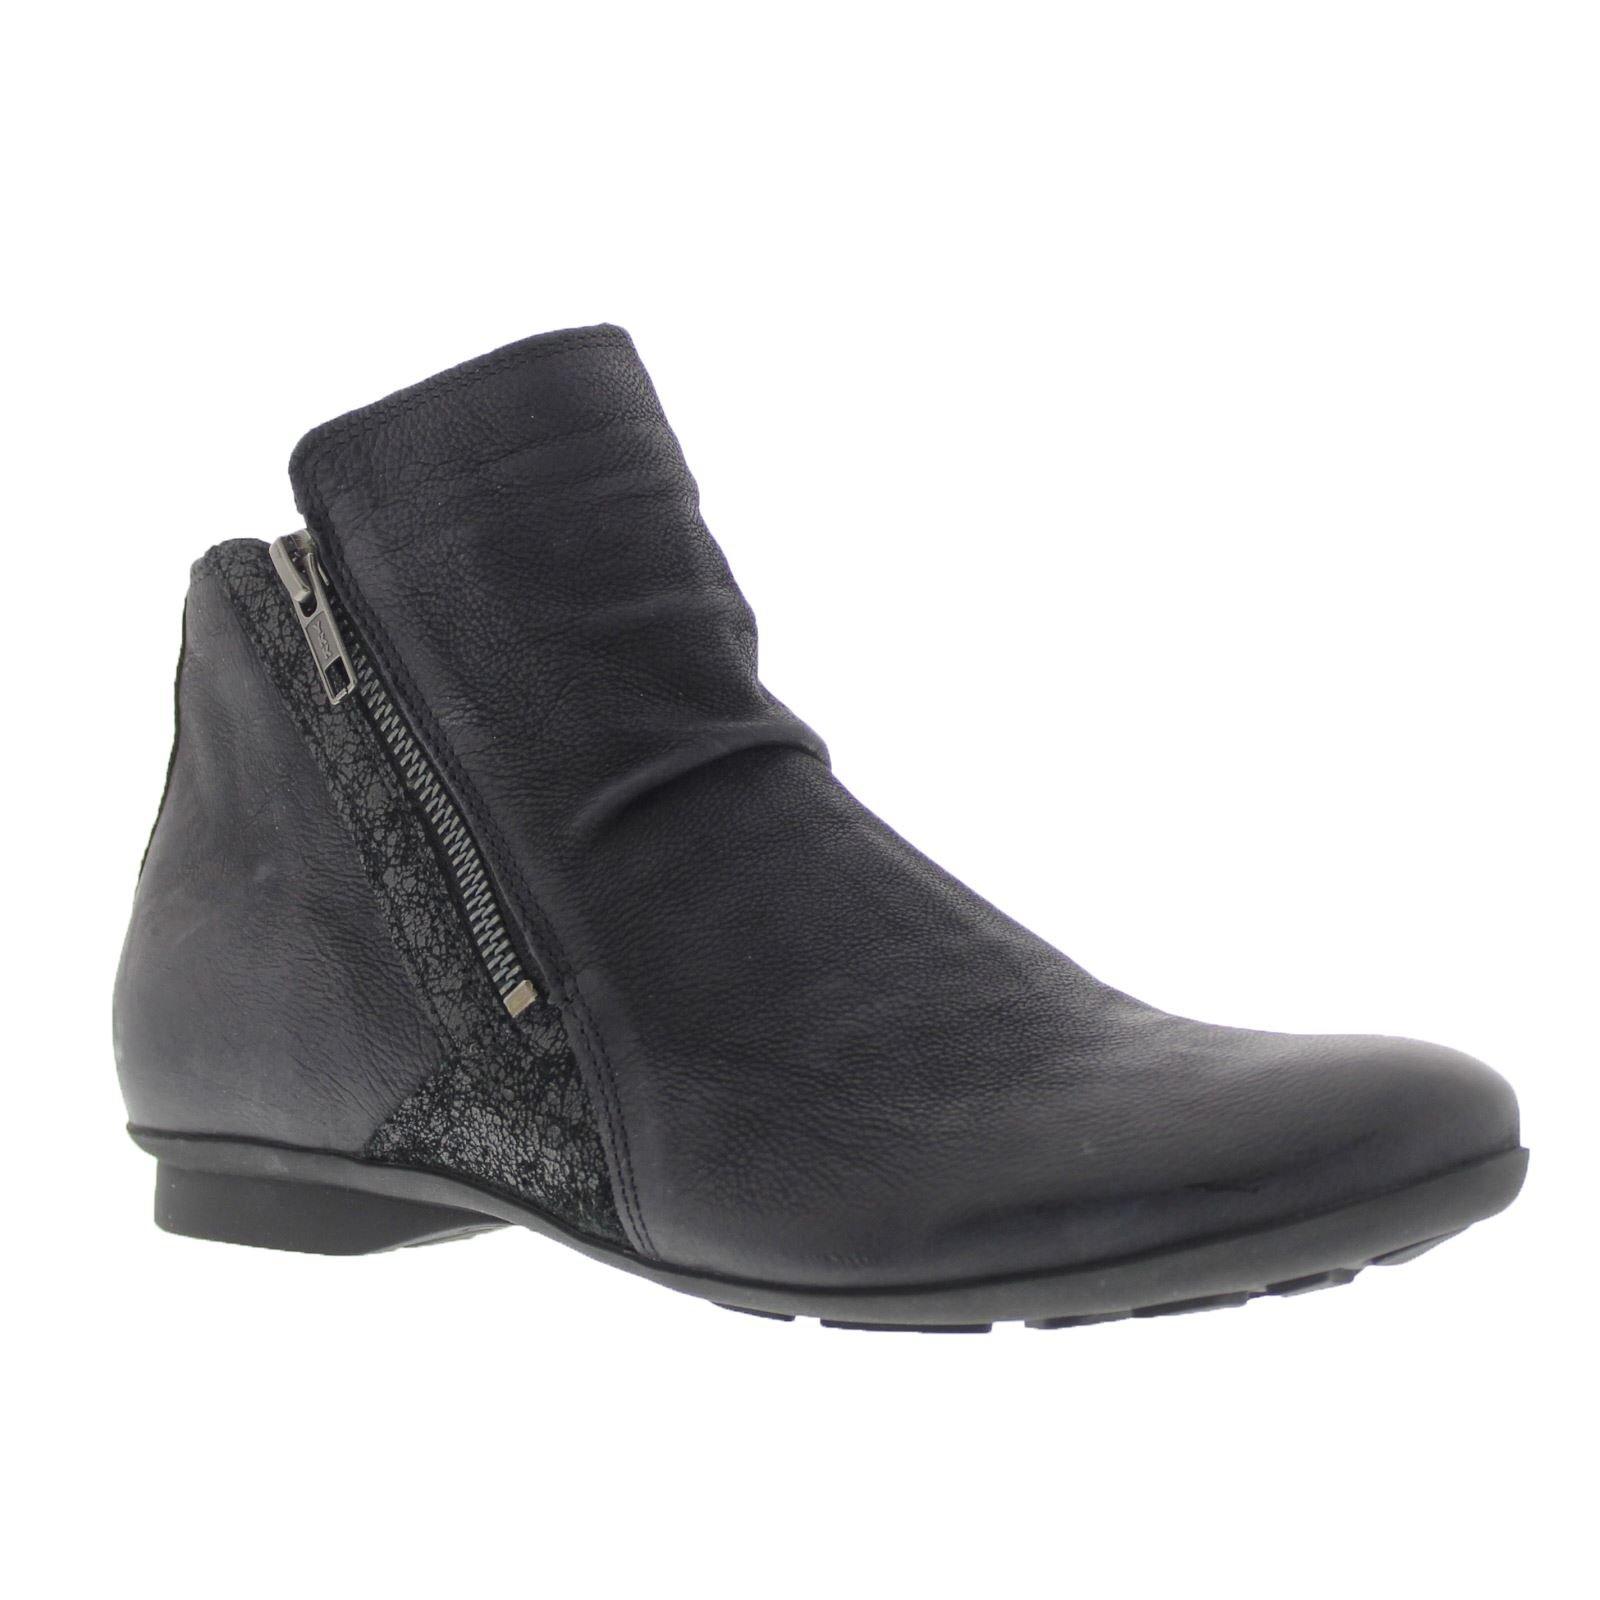 Think Womens Keshuel Black Kombi Leather Boots 39 EU